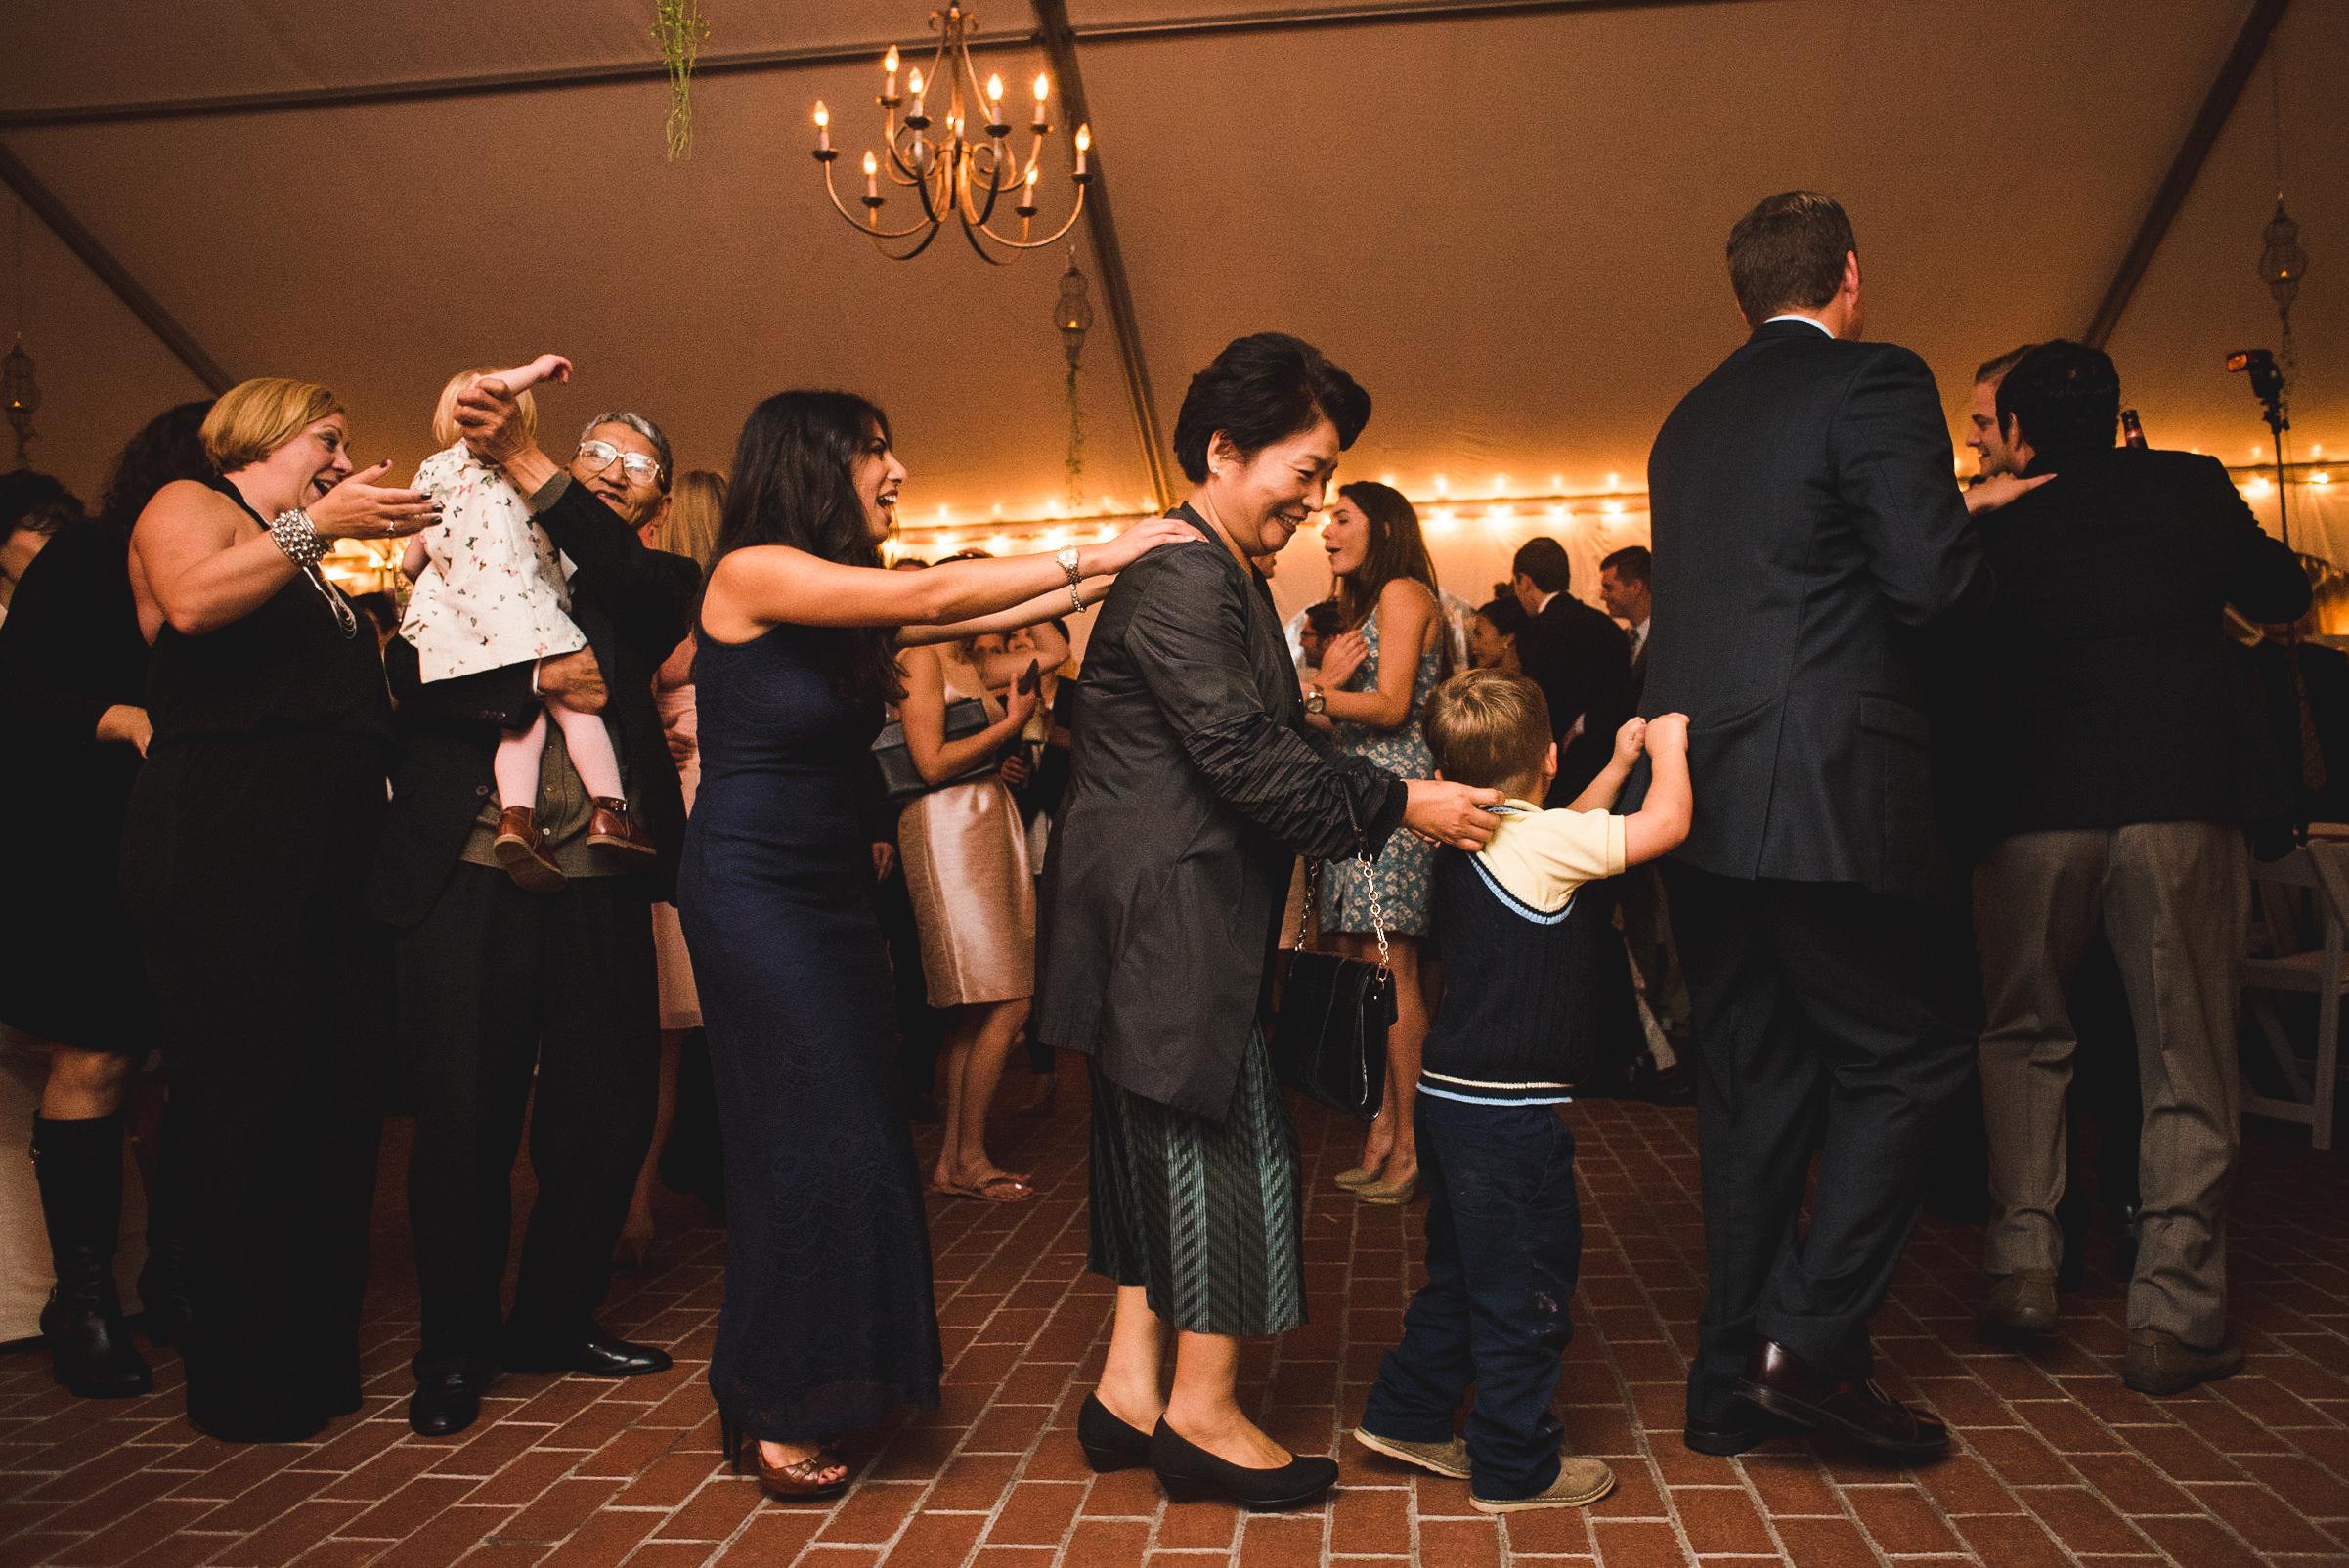 Wedding at Woodlawn Manor Sandy Spring Maryland by Mantas Kubilinskas-31.jpg